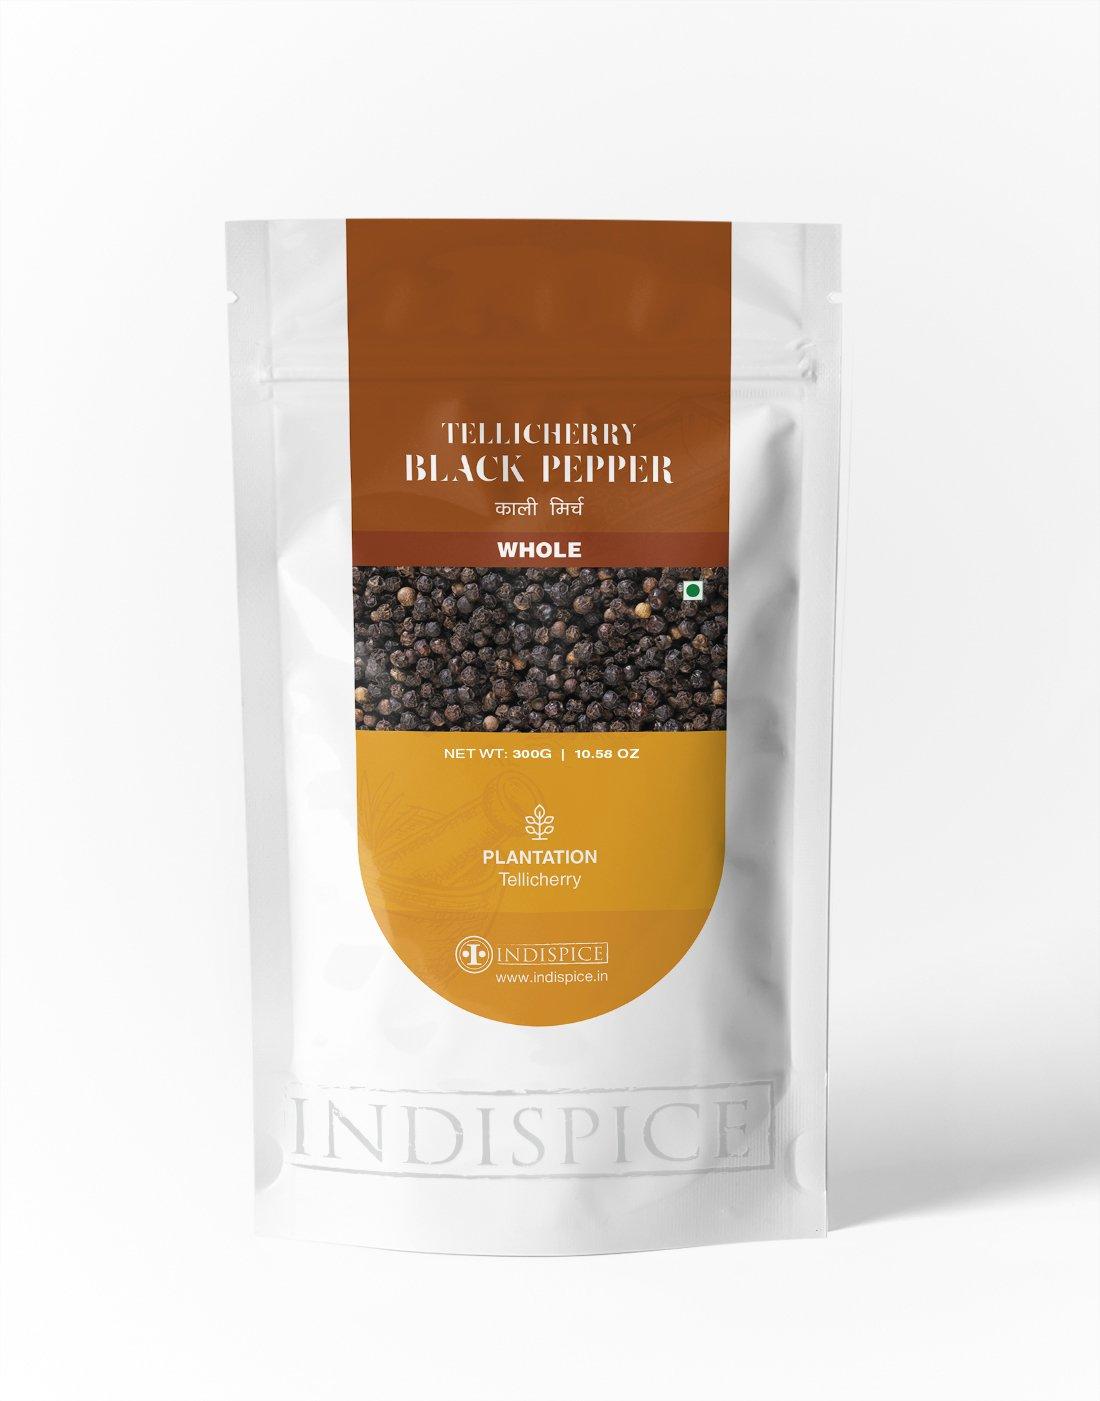 IndiSpice Tellicherry Black Pepper | Sourced From Finest Tellicherry Plantations in India (10.58 Oz)